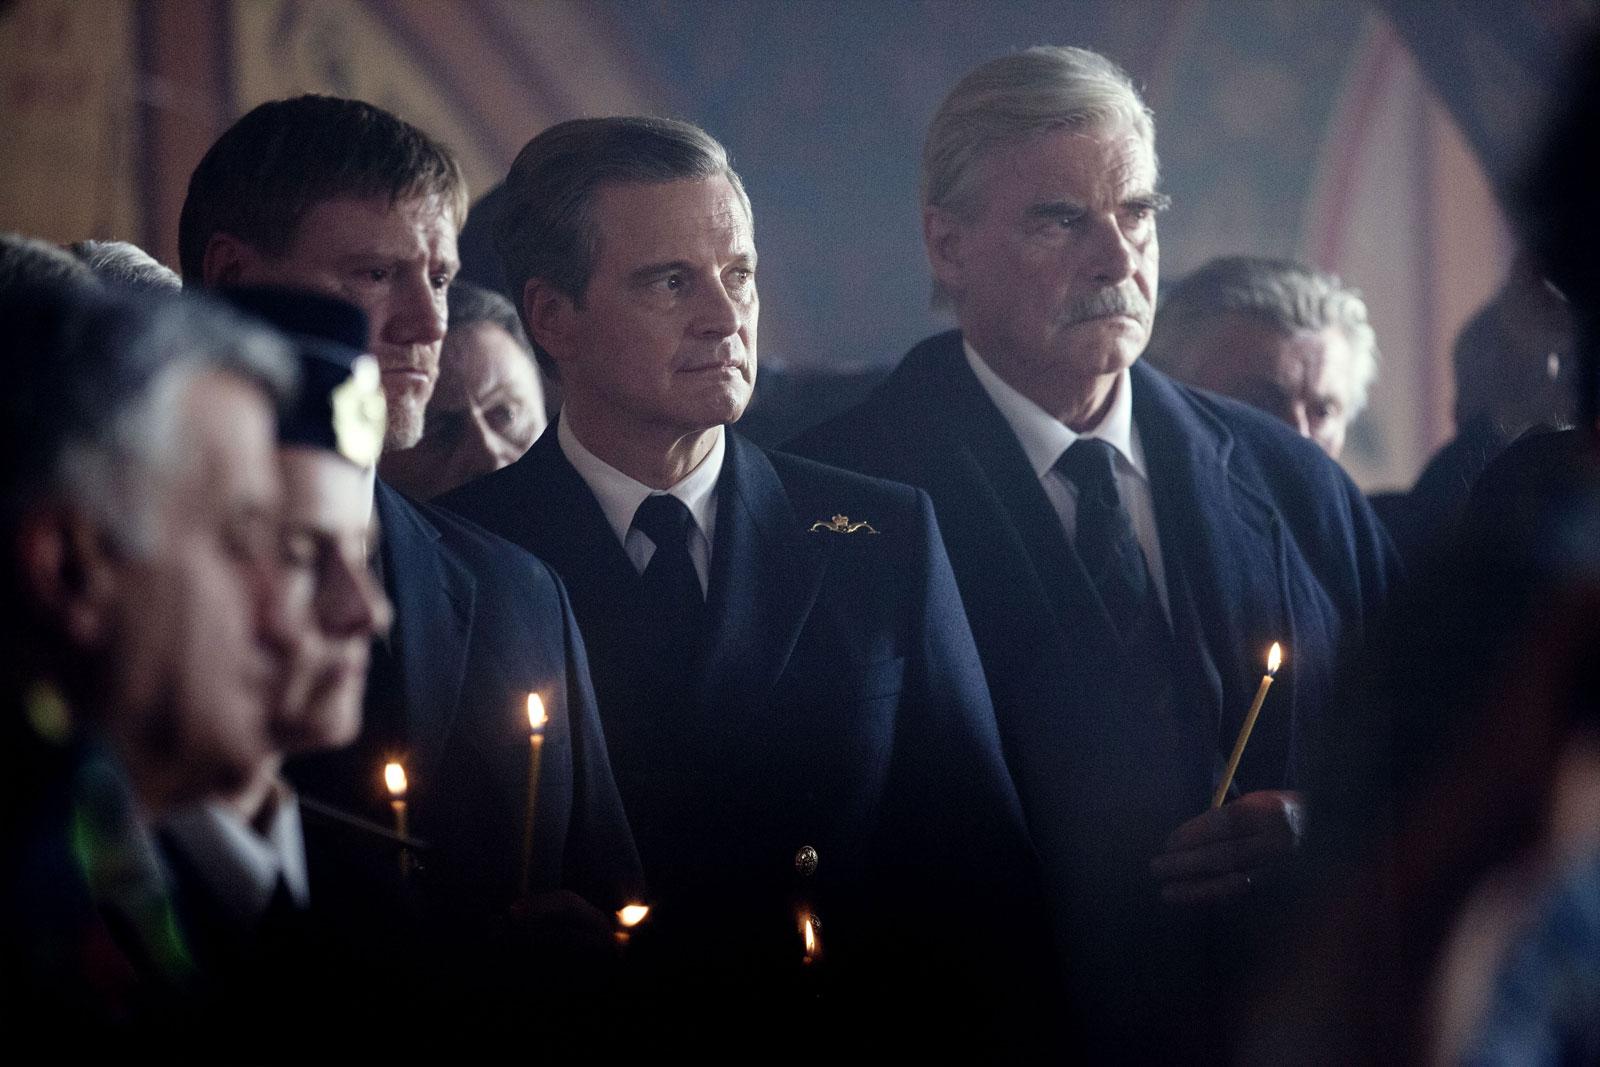 Kursk Colin Firth critique film avis photo